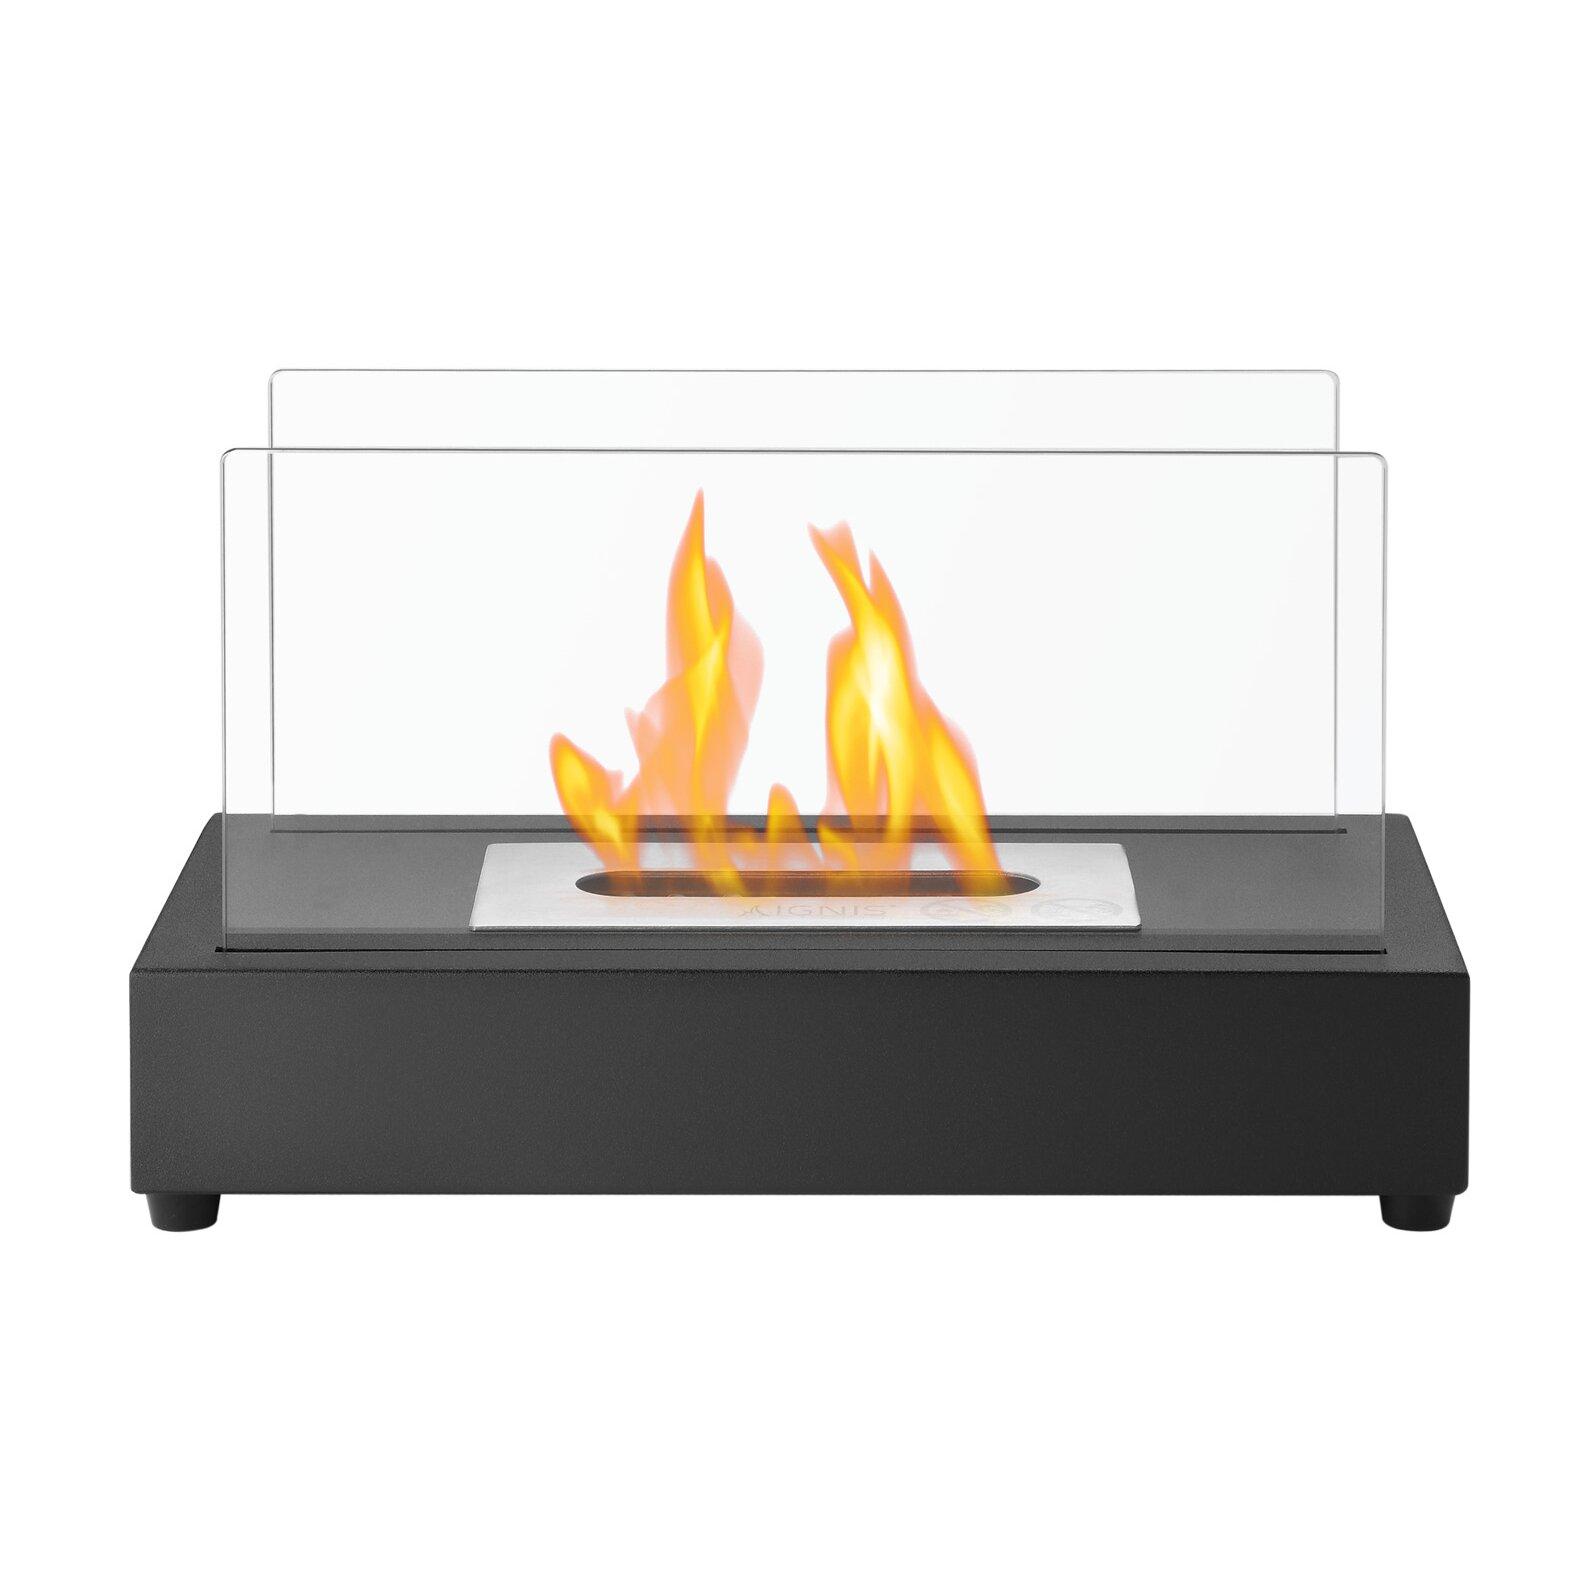 Ignis Tower Ventless Bio Ethanol Tabletop Fireplace Wayfair